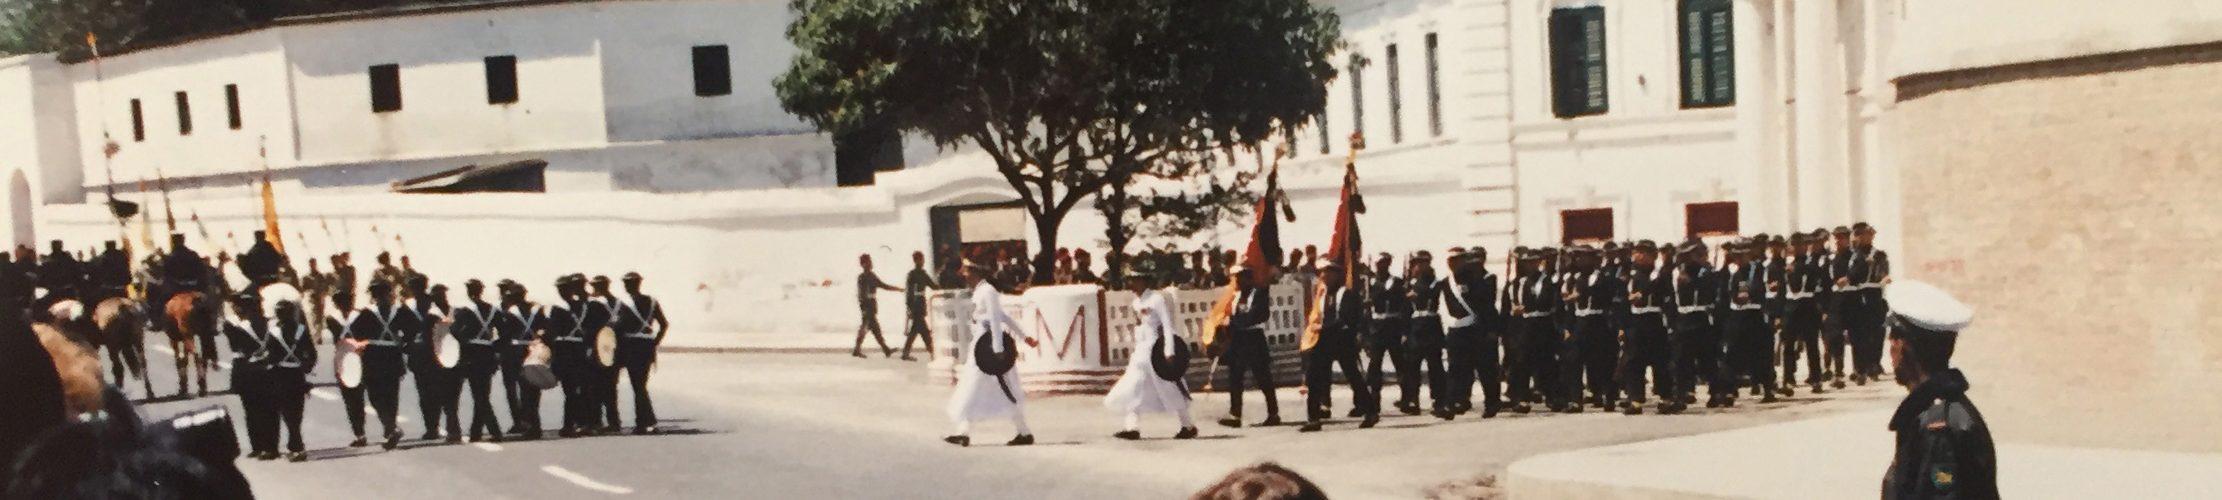 Kathmandu-1987-festival-Nepals-konge